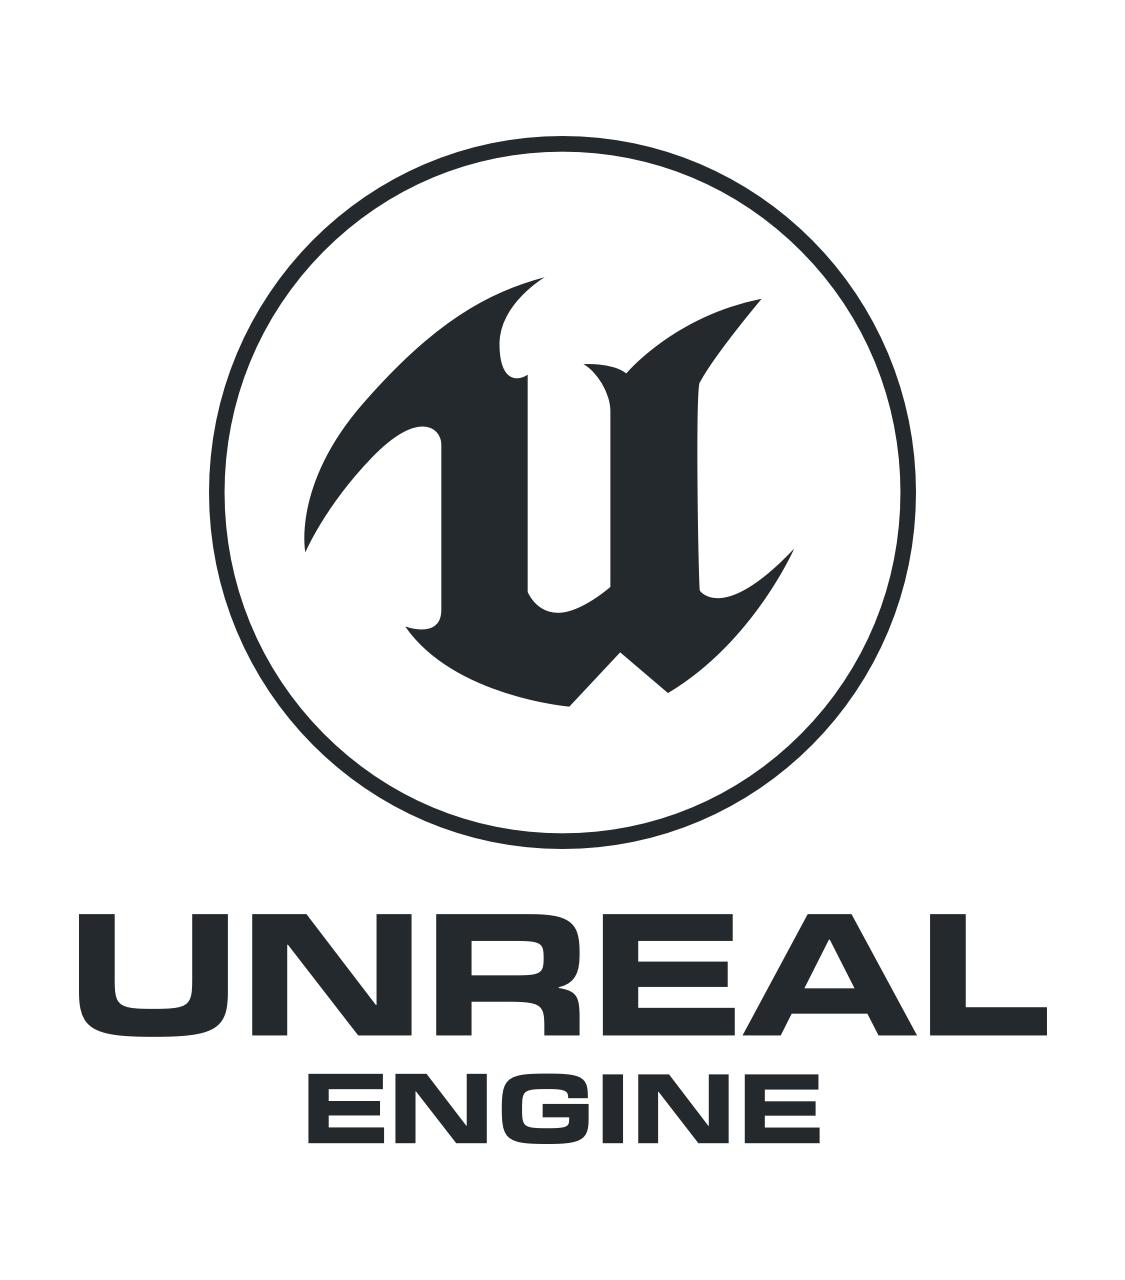 Epics Unreal team acquires Twinmotion from Abvent • GraphicSpeak